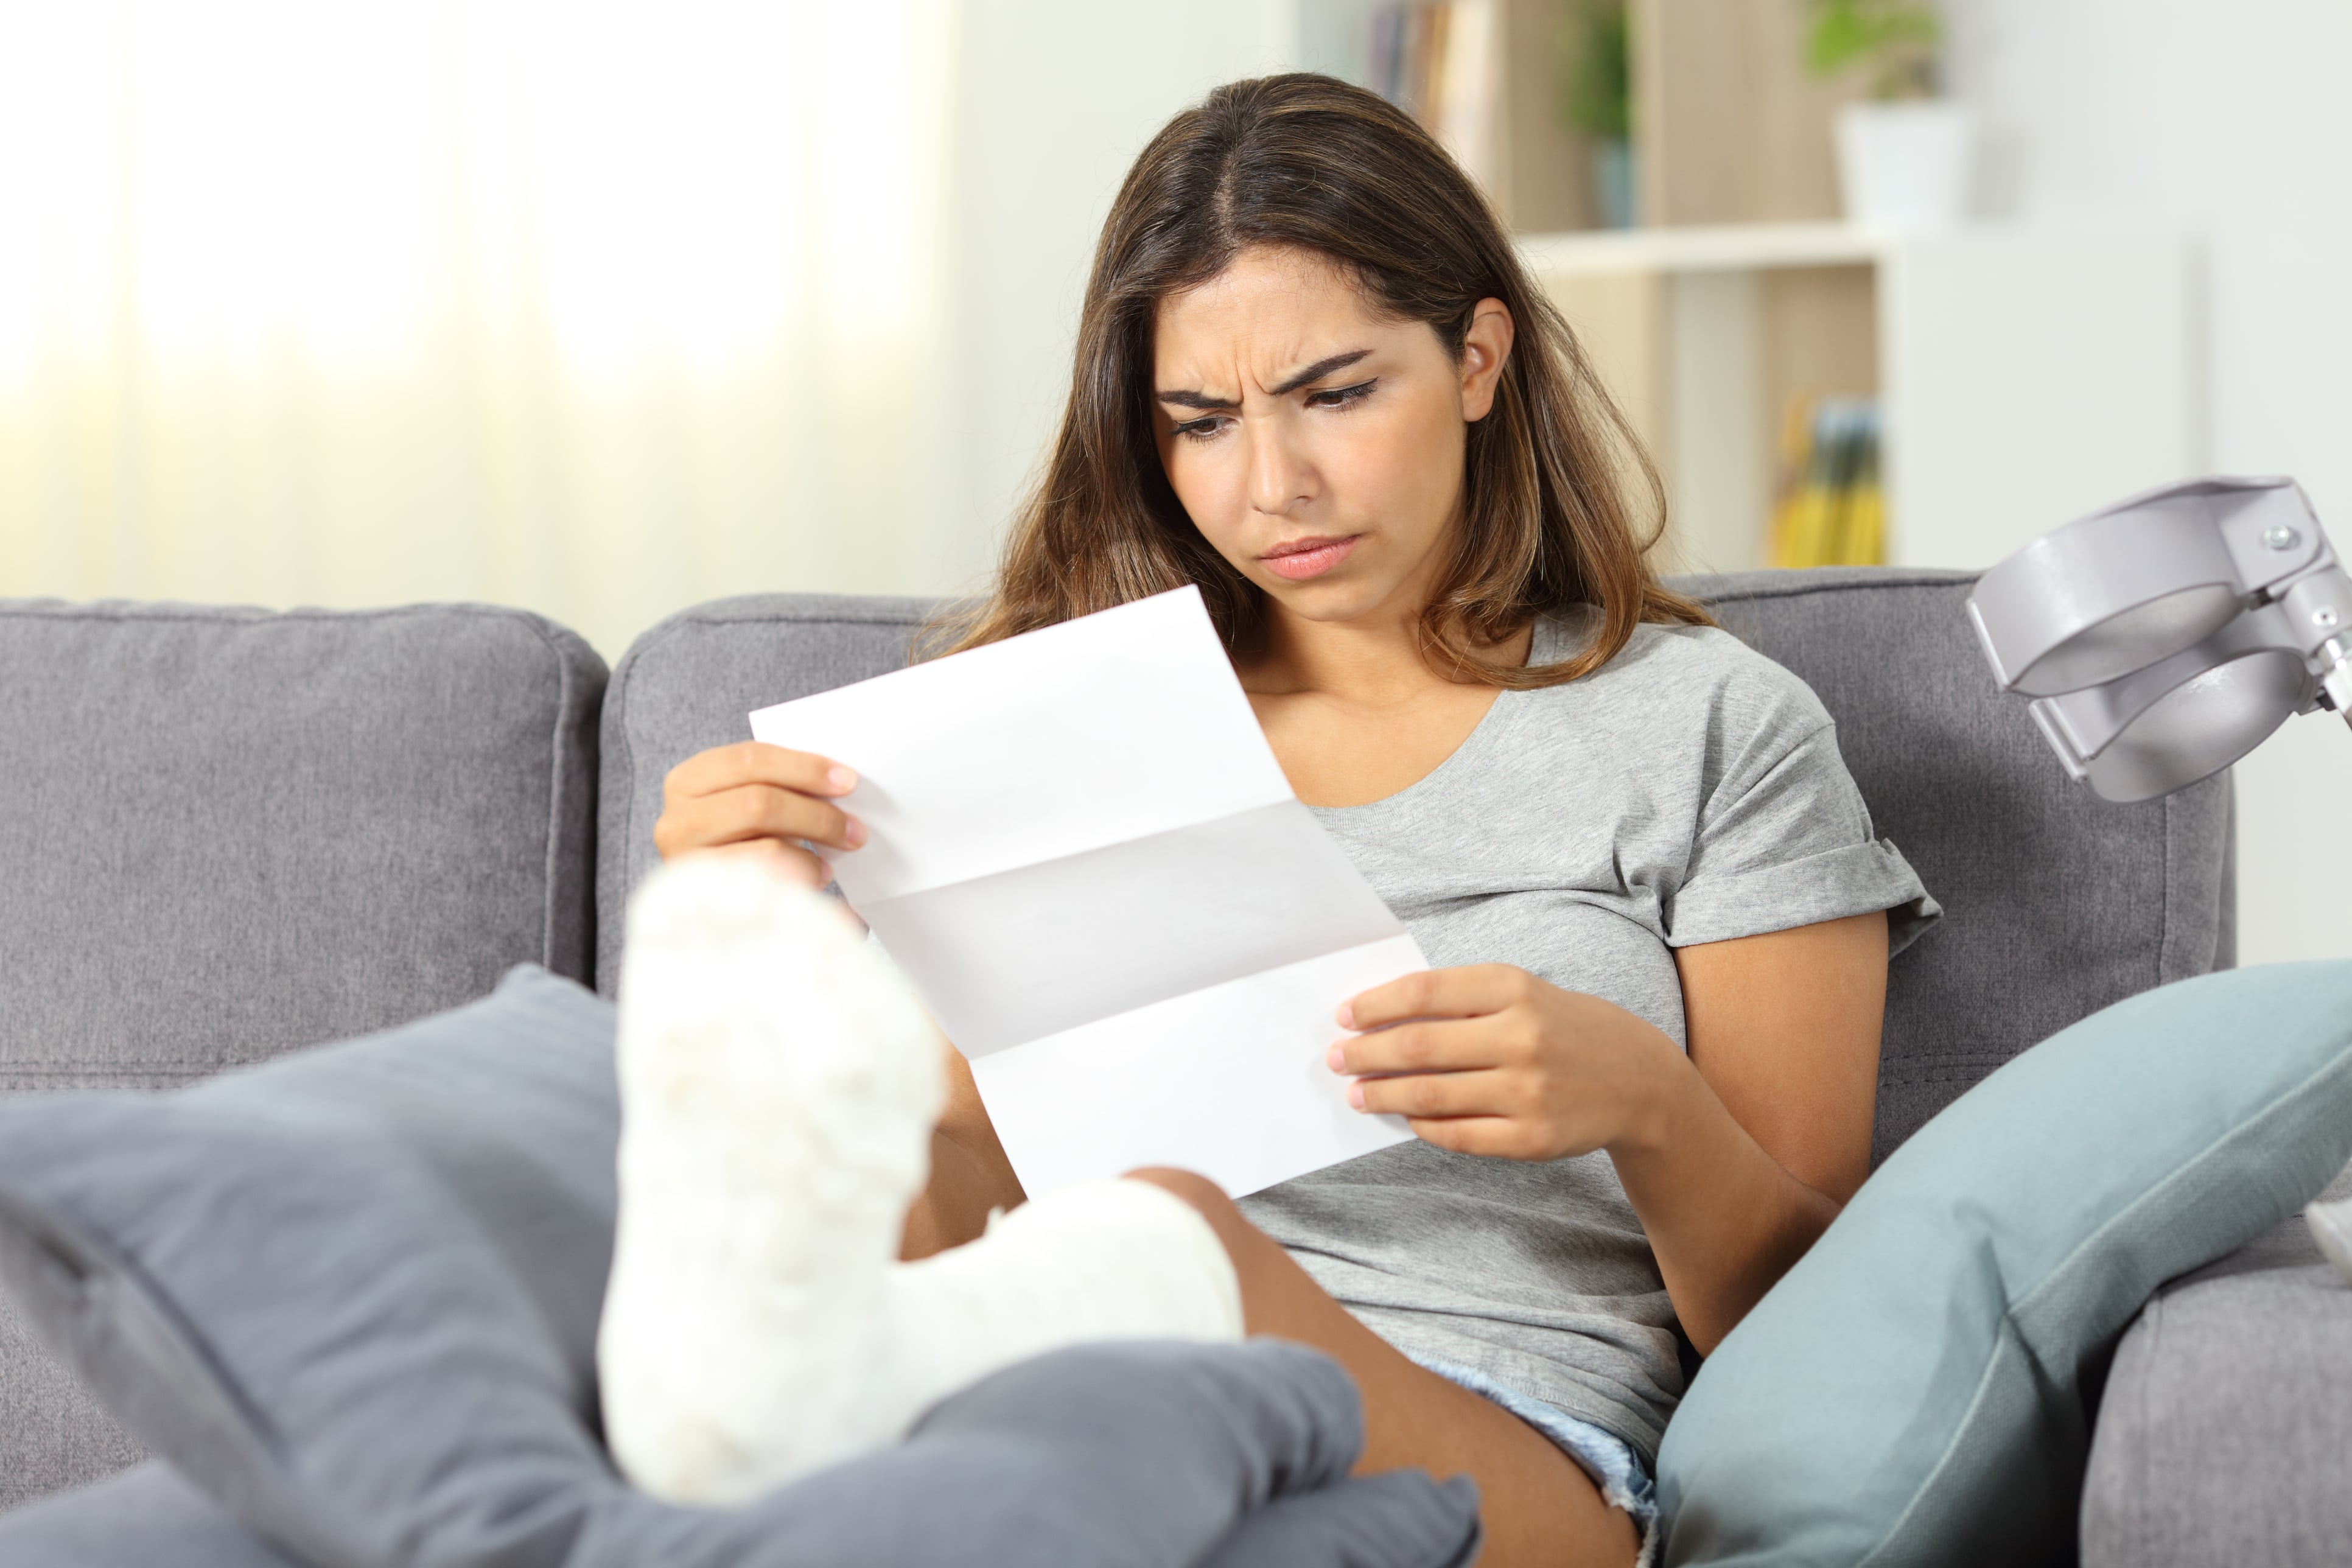 Woman with broken leg reviewing medical bills.